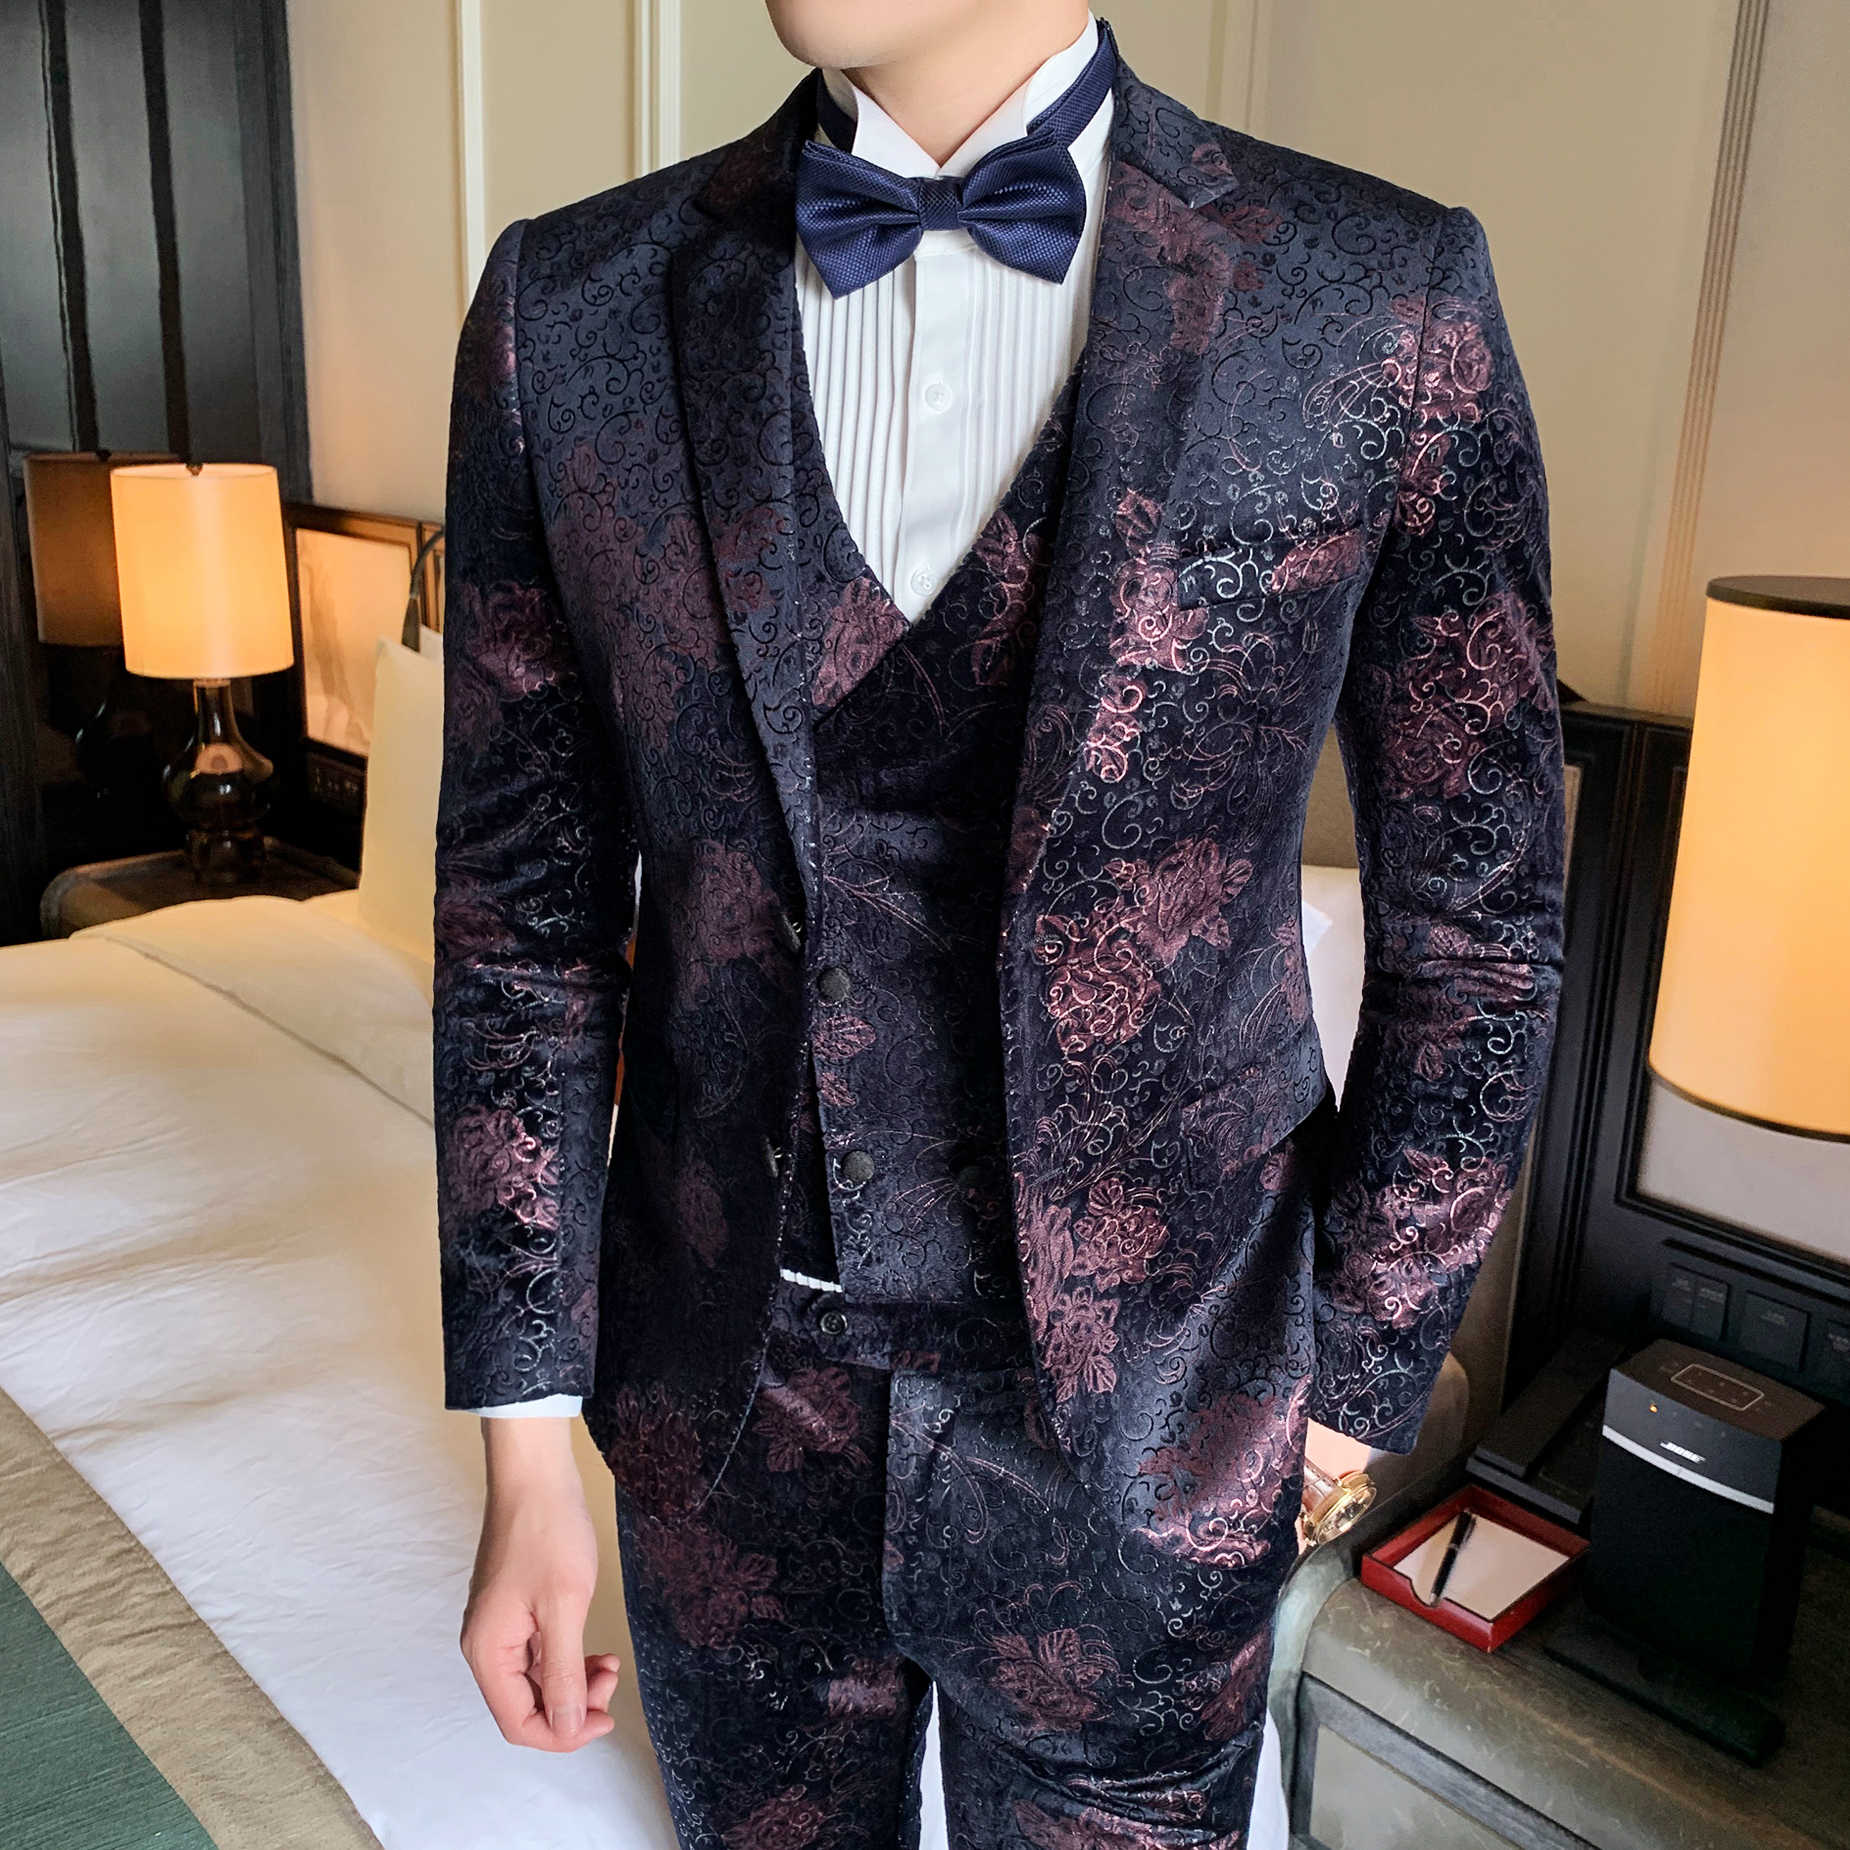 One Button Wedding Suit For Men Business Suits Men S-3XL Brand New Slim Fit Casual 3pc Men Dress Suit Night Club Party Tuxedo